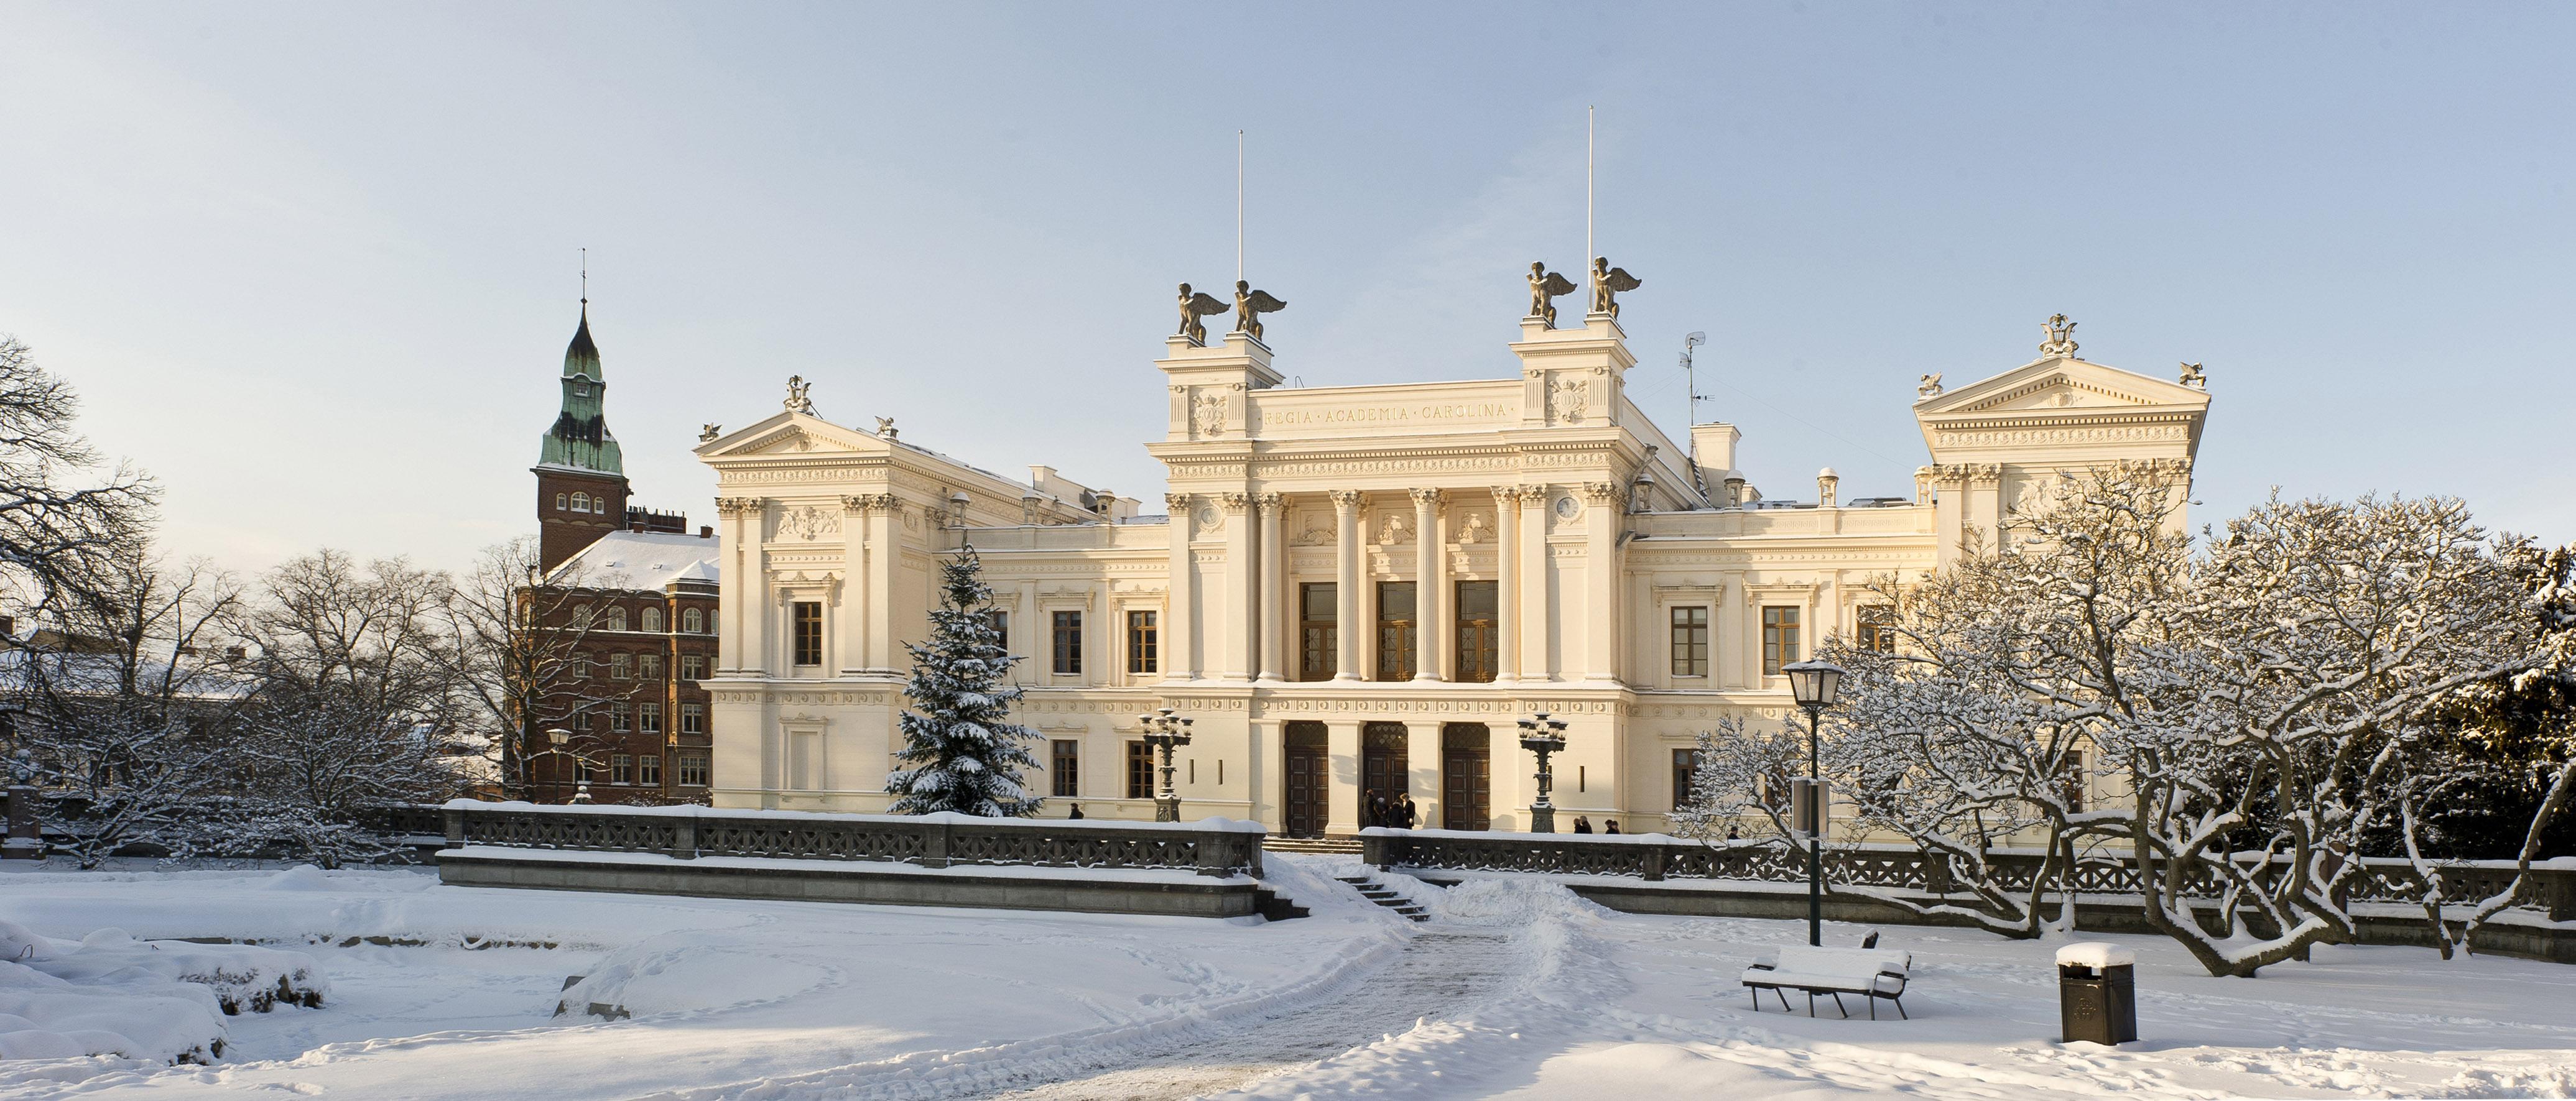 186 univ huset snow